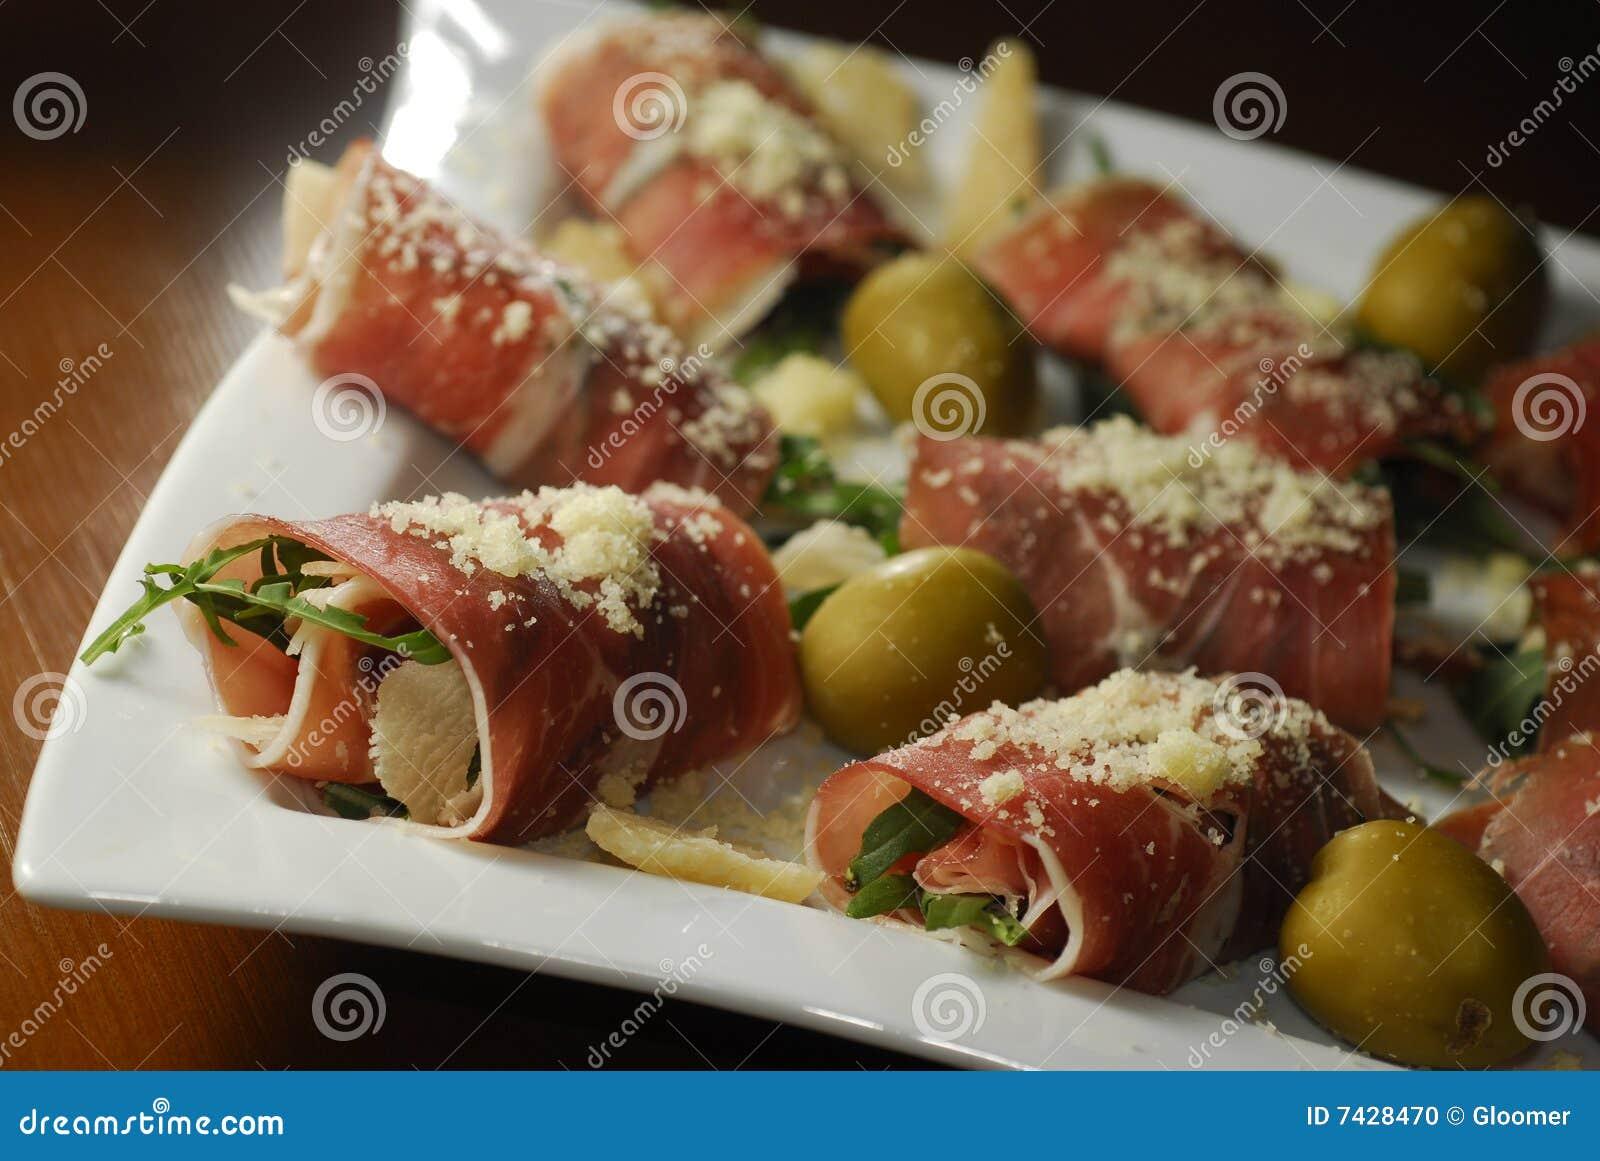 Italian snacks stock photo image 7428470 for Italian snacks